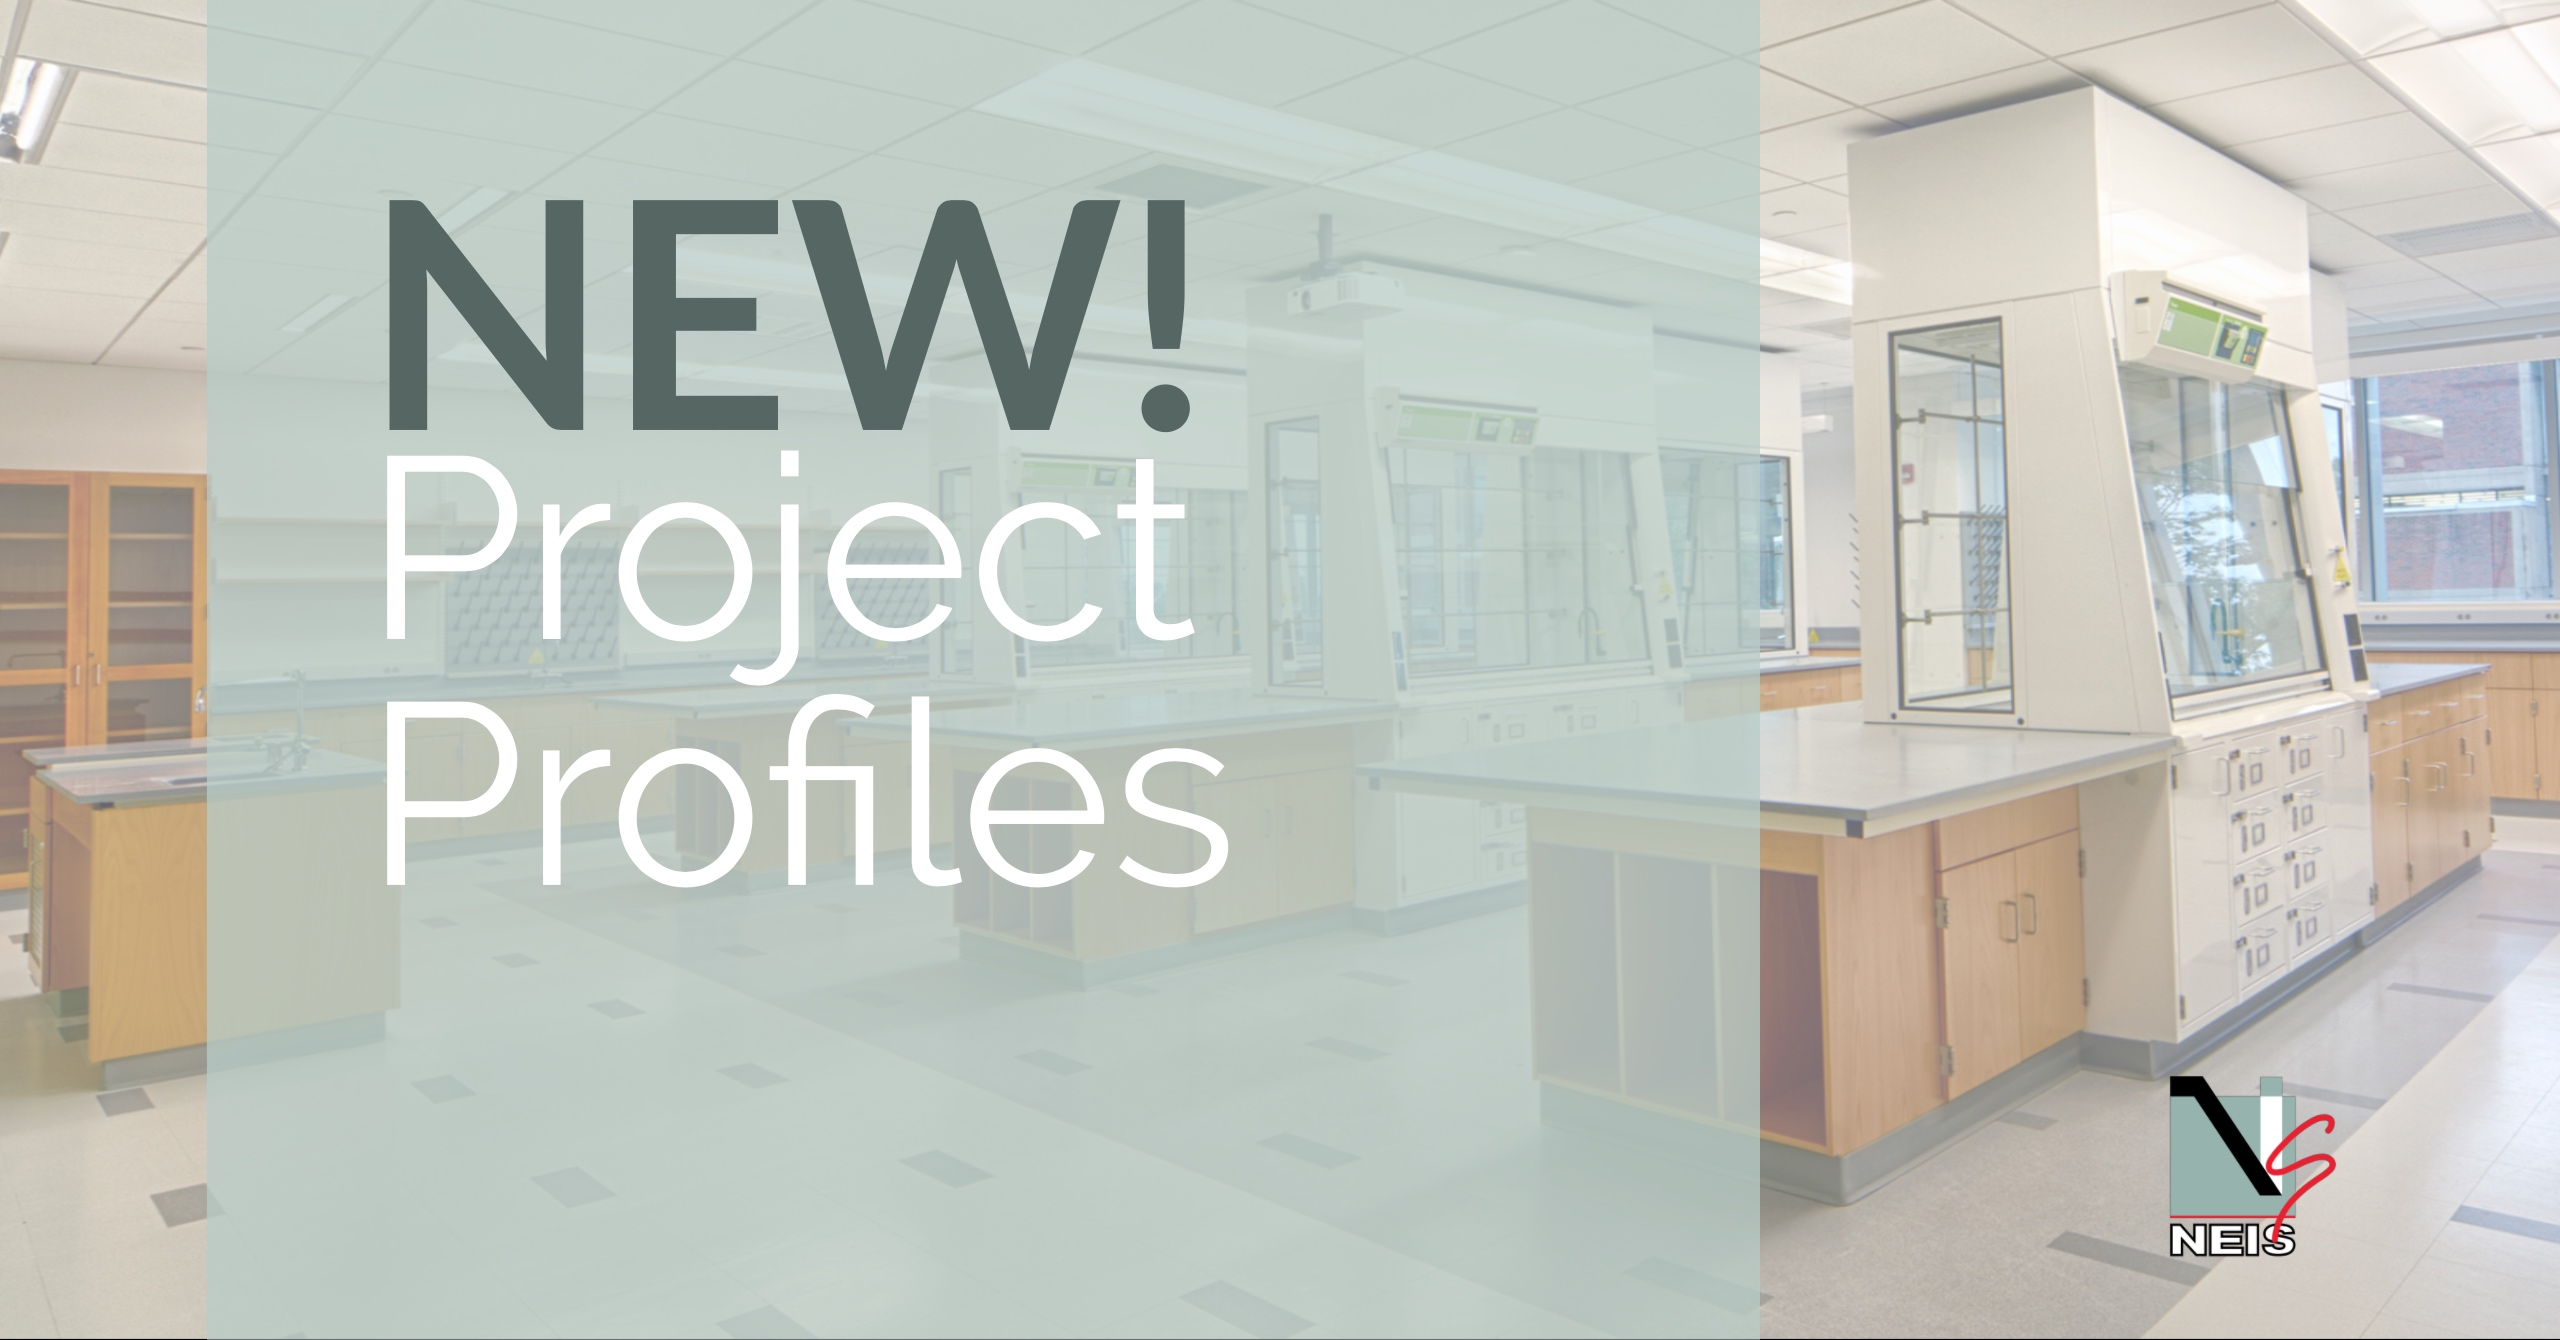 NEIS: NEW Project Profiles! - photo